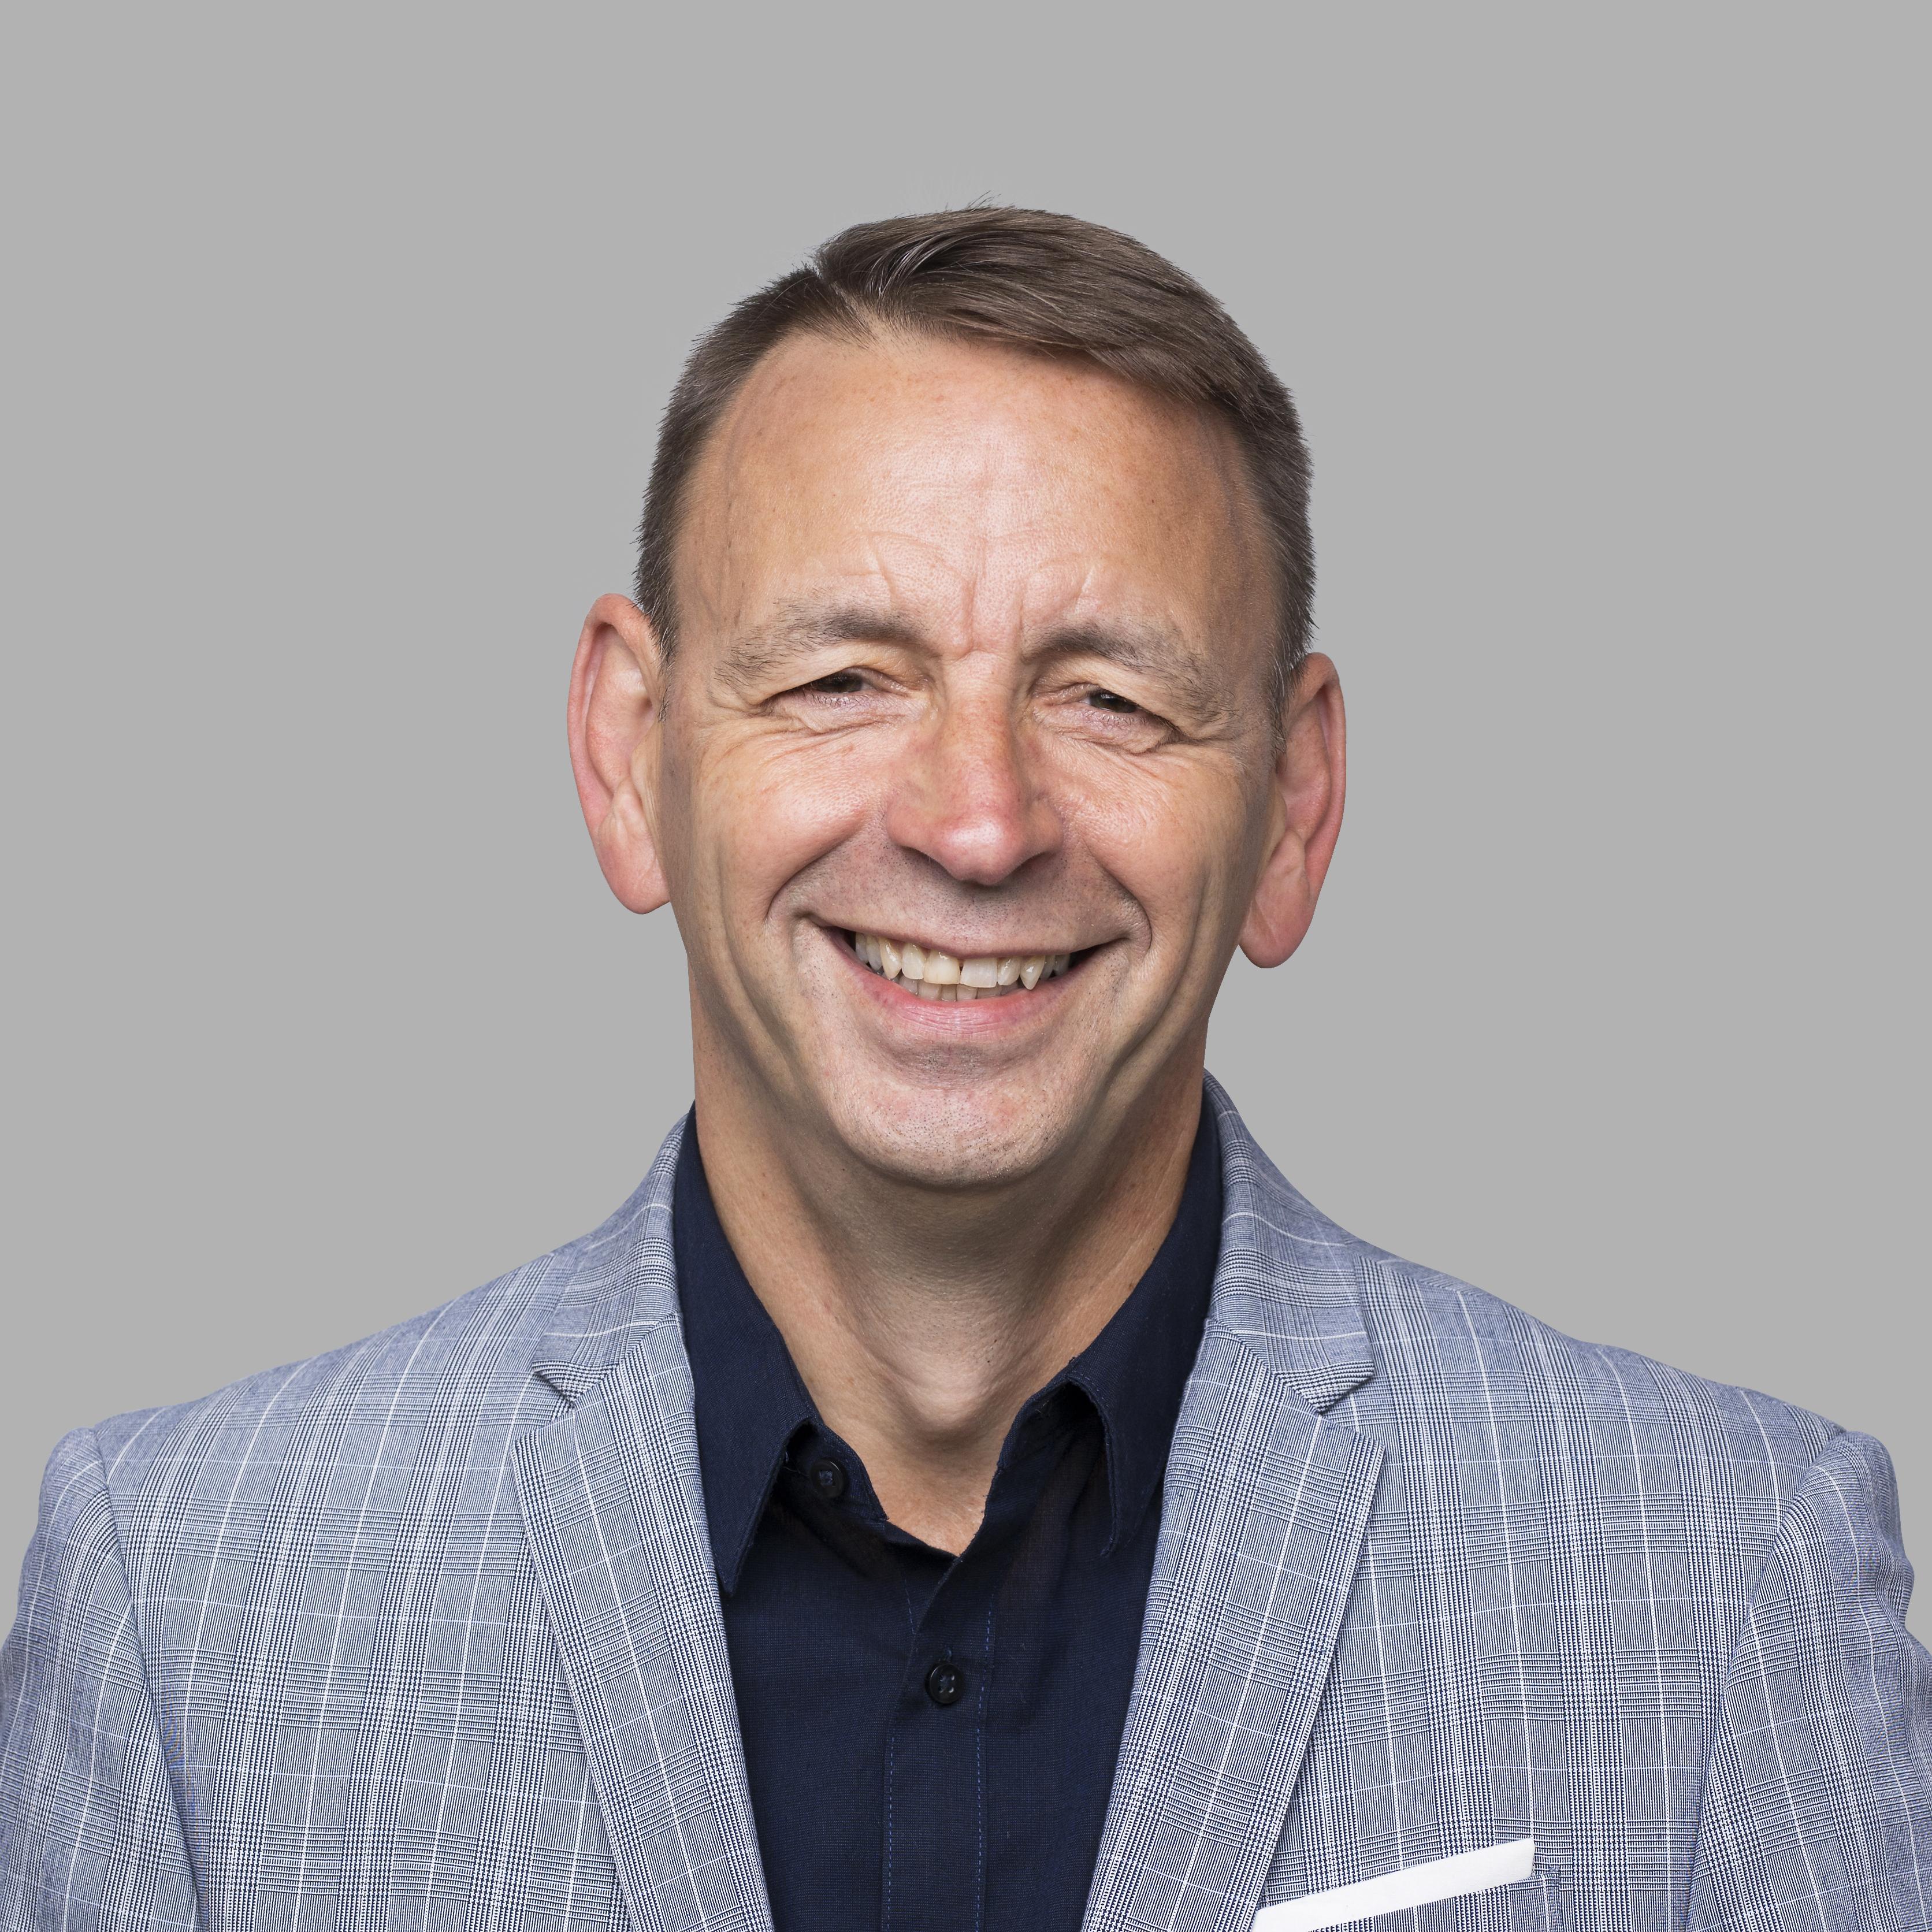 Willem Dissel